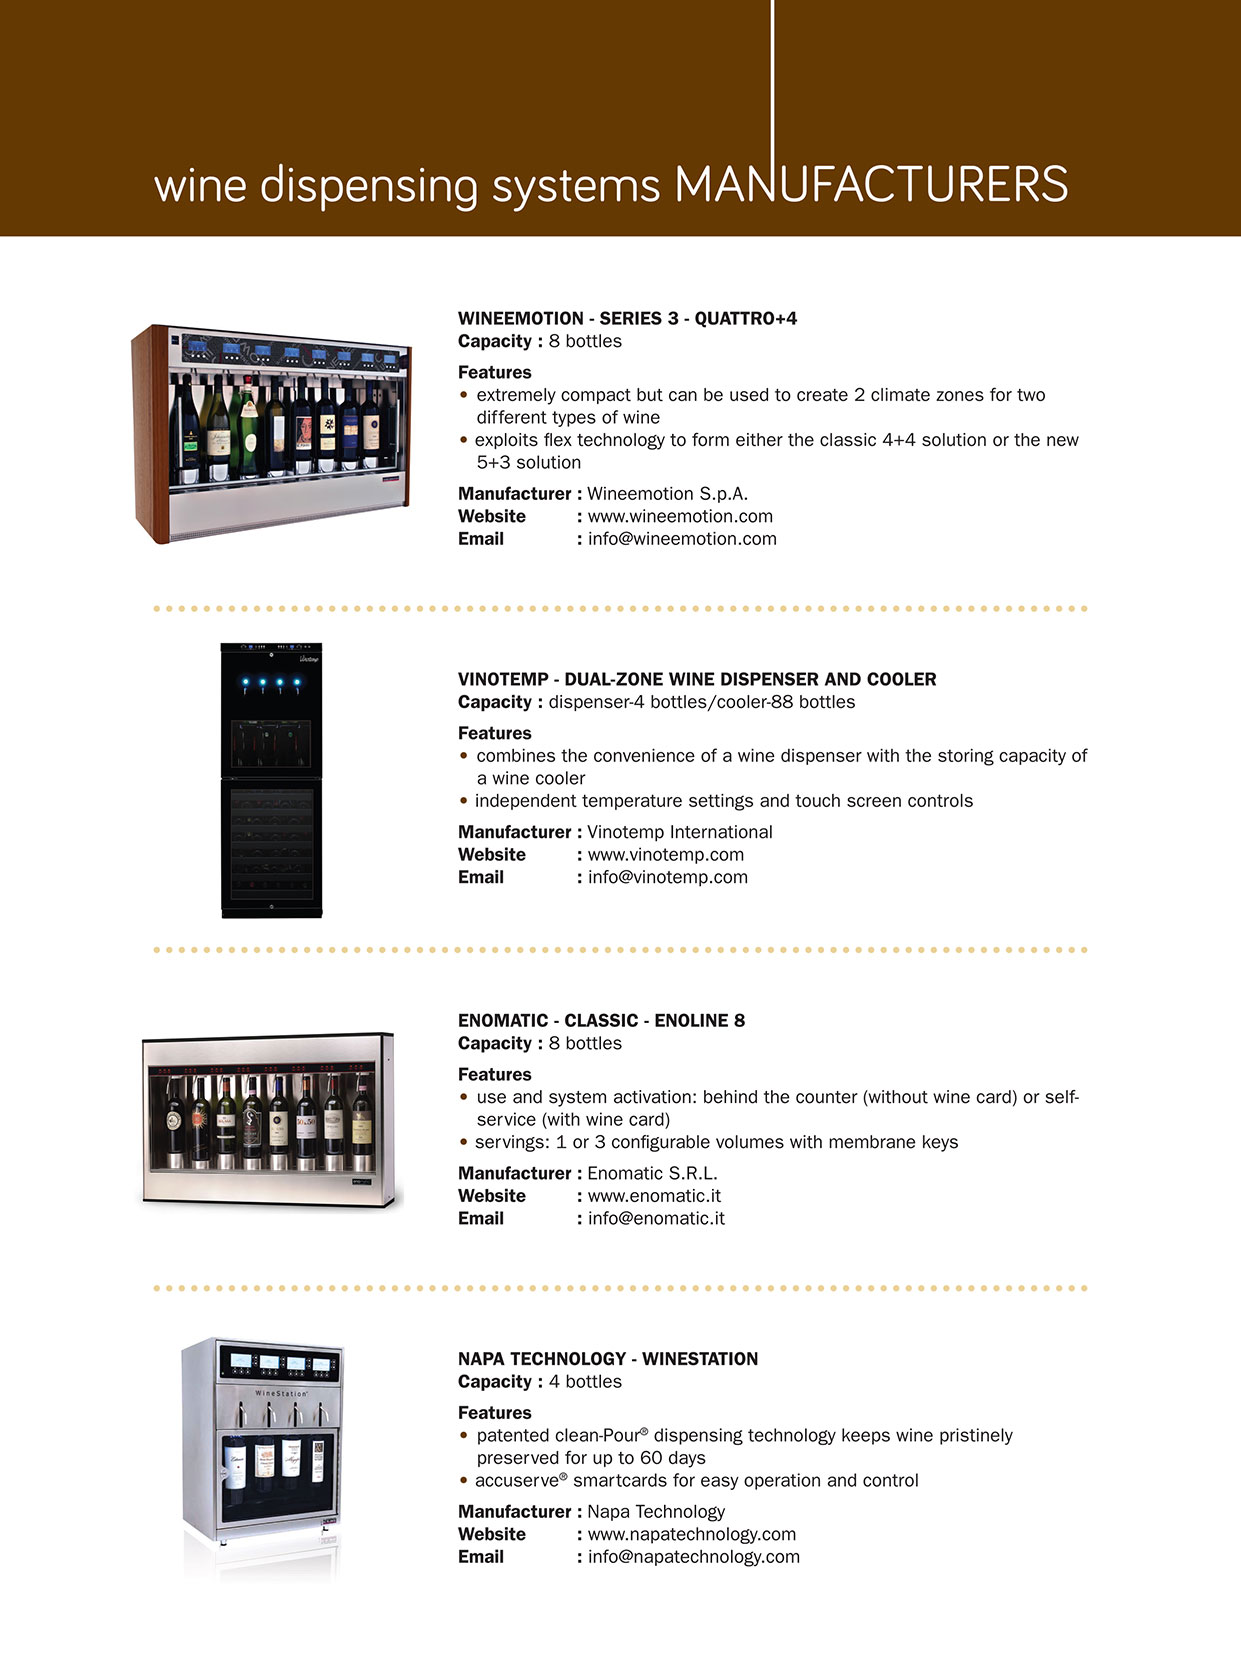 Equipment-WineDispensing